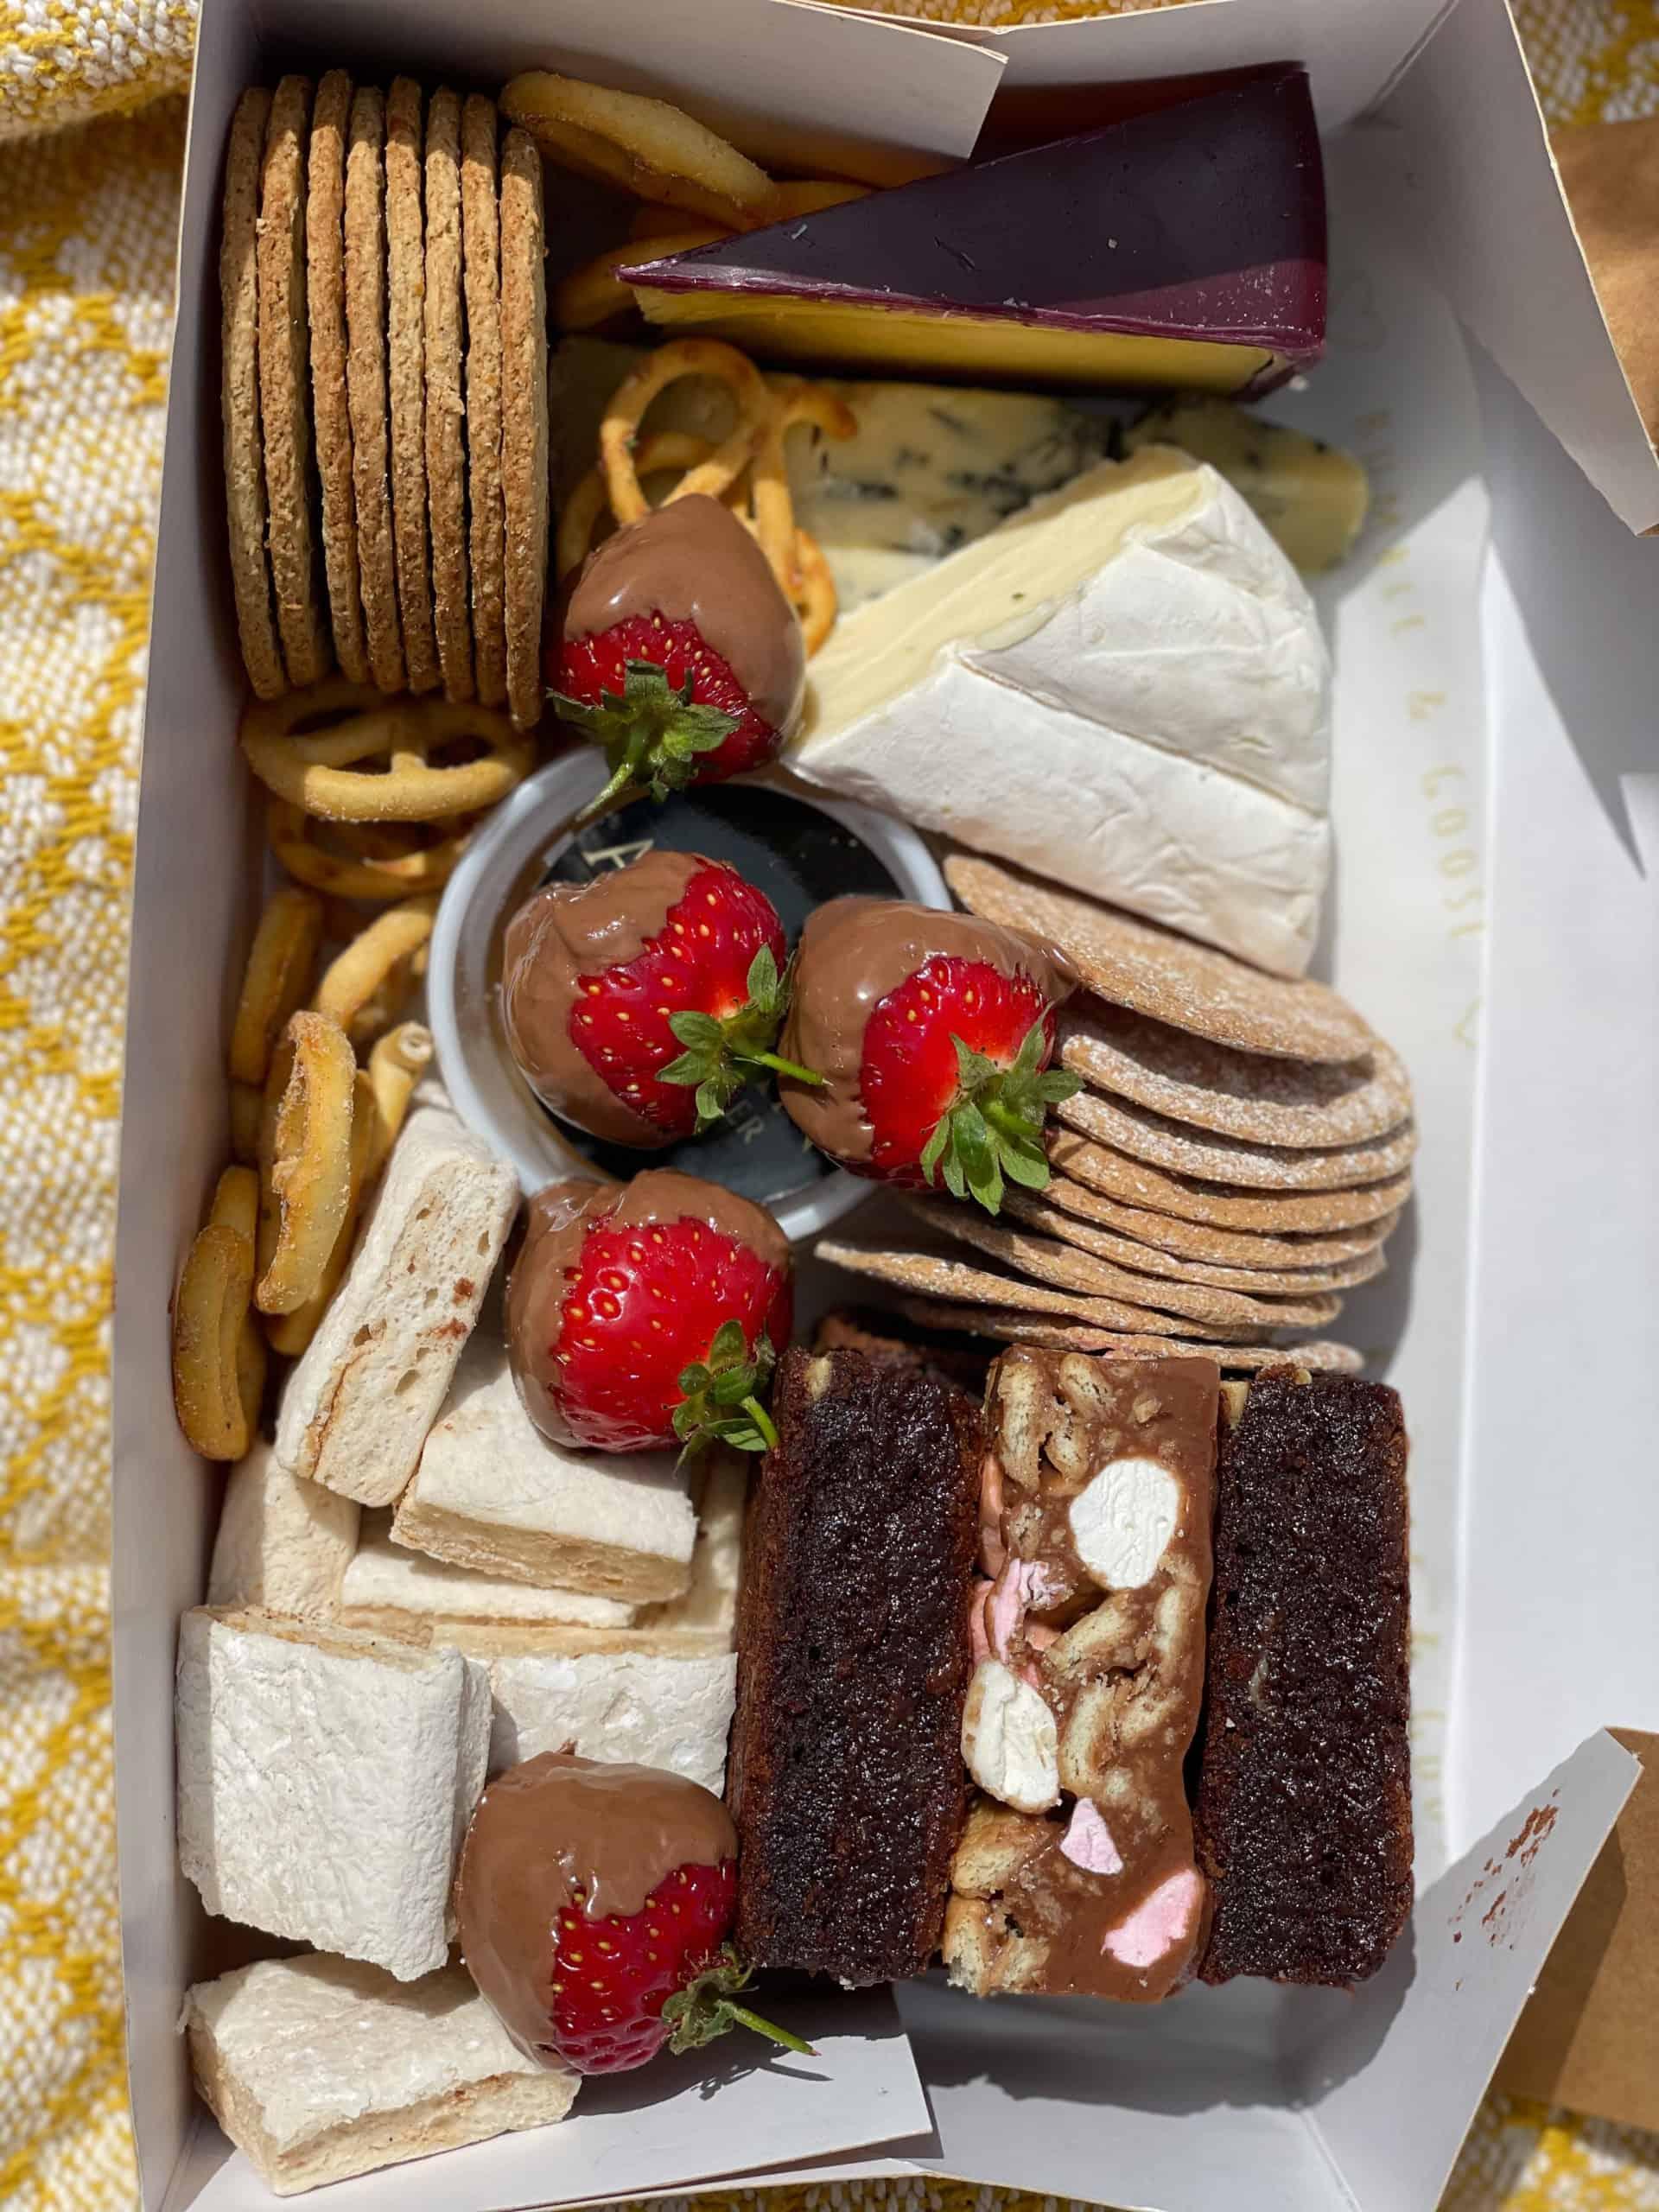 Bangor Open House Festival Food Box Gallery Image